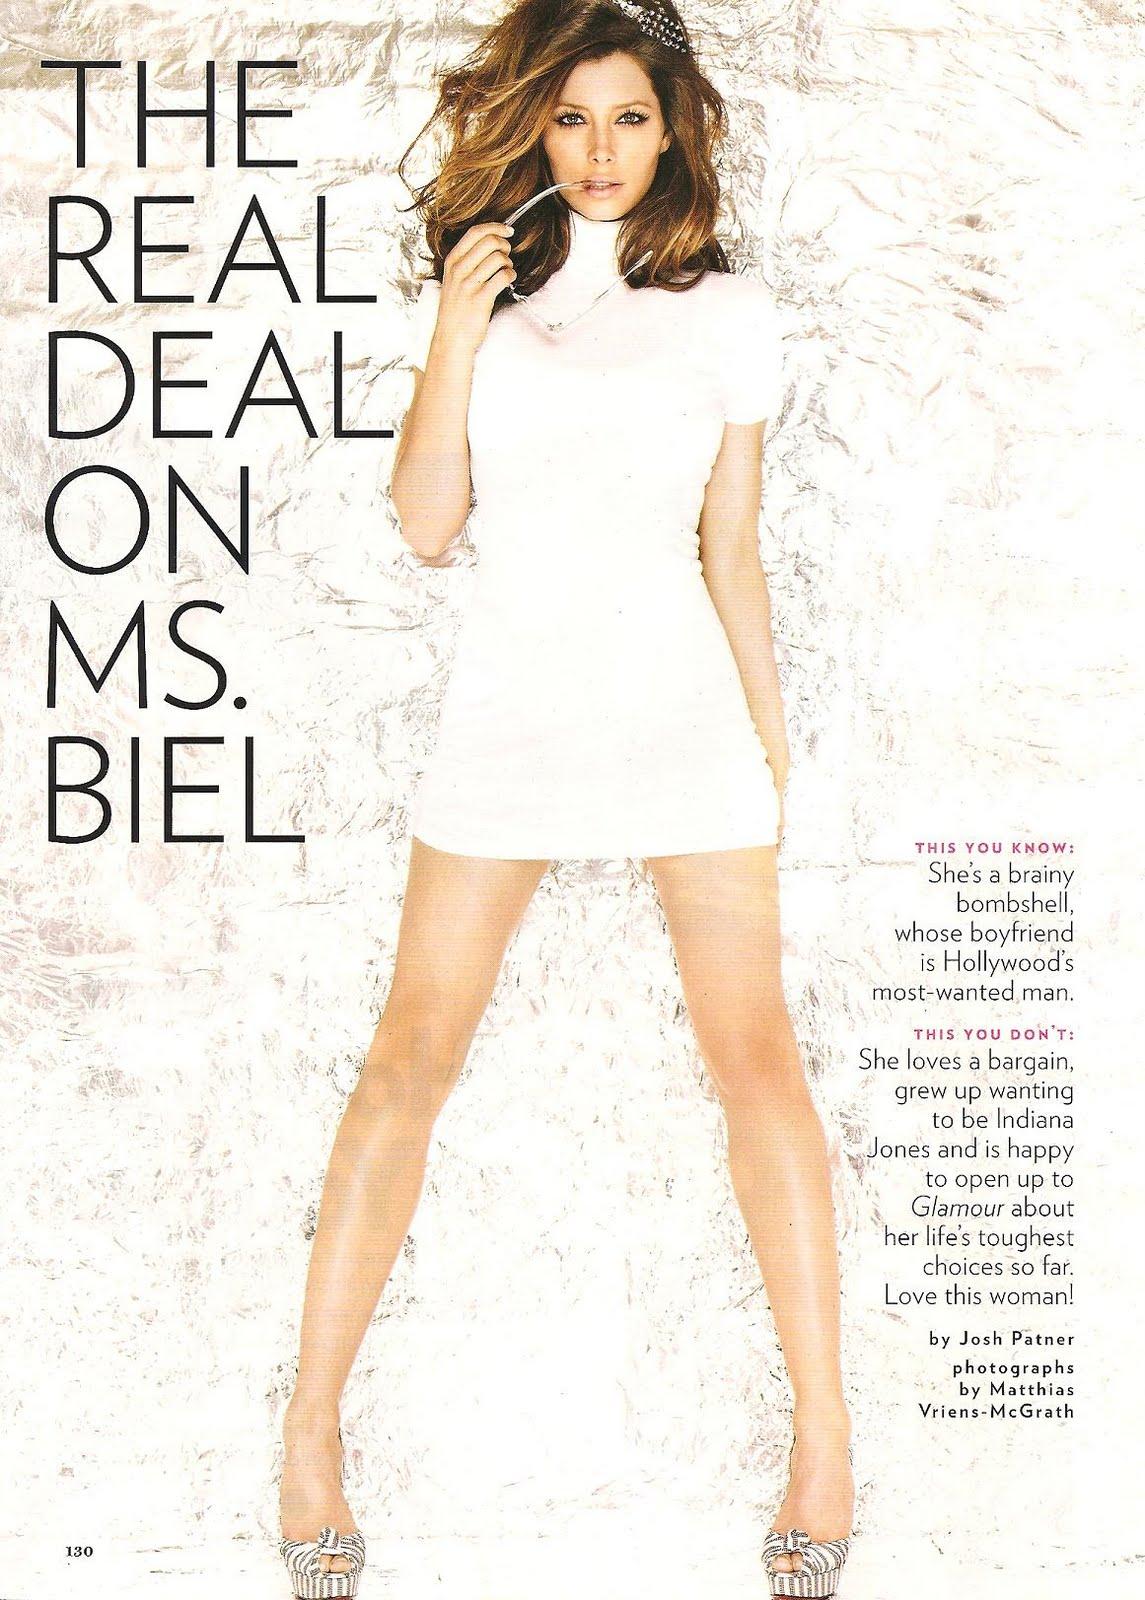 architec and home: jessica biel glamour magazine (july 2010)